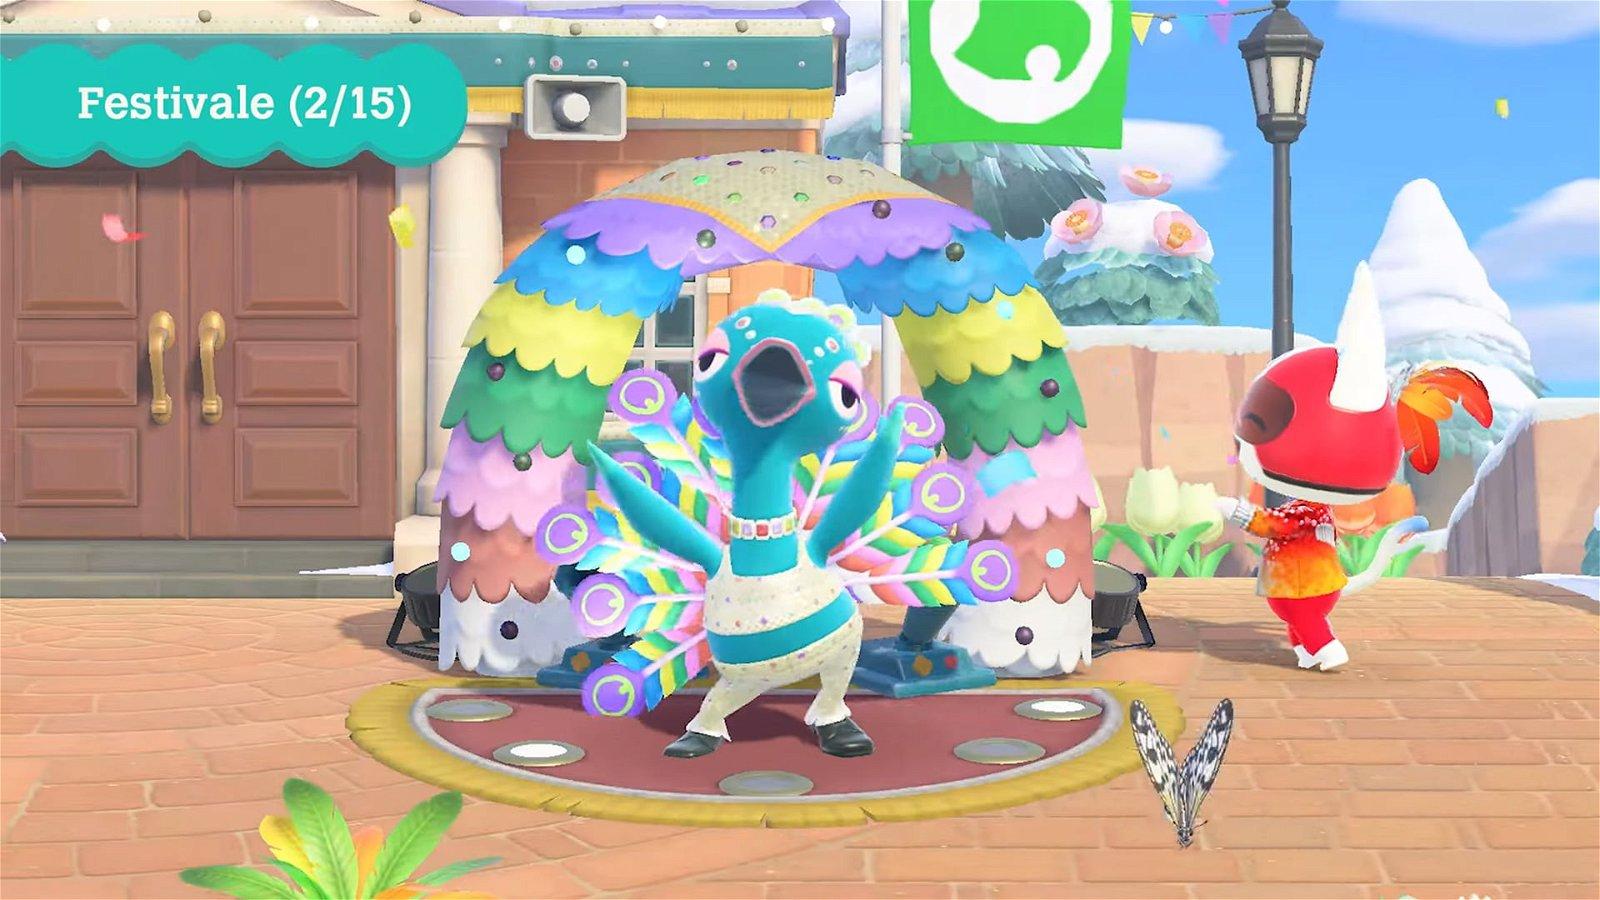 Animal Crossing New Horizons Celebrates Festivale February 15 1